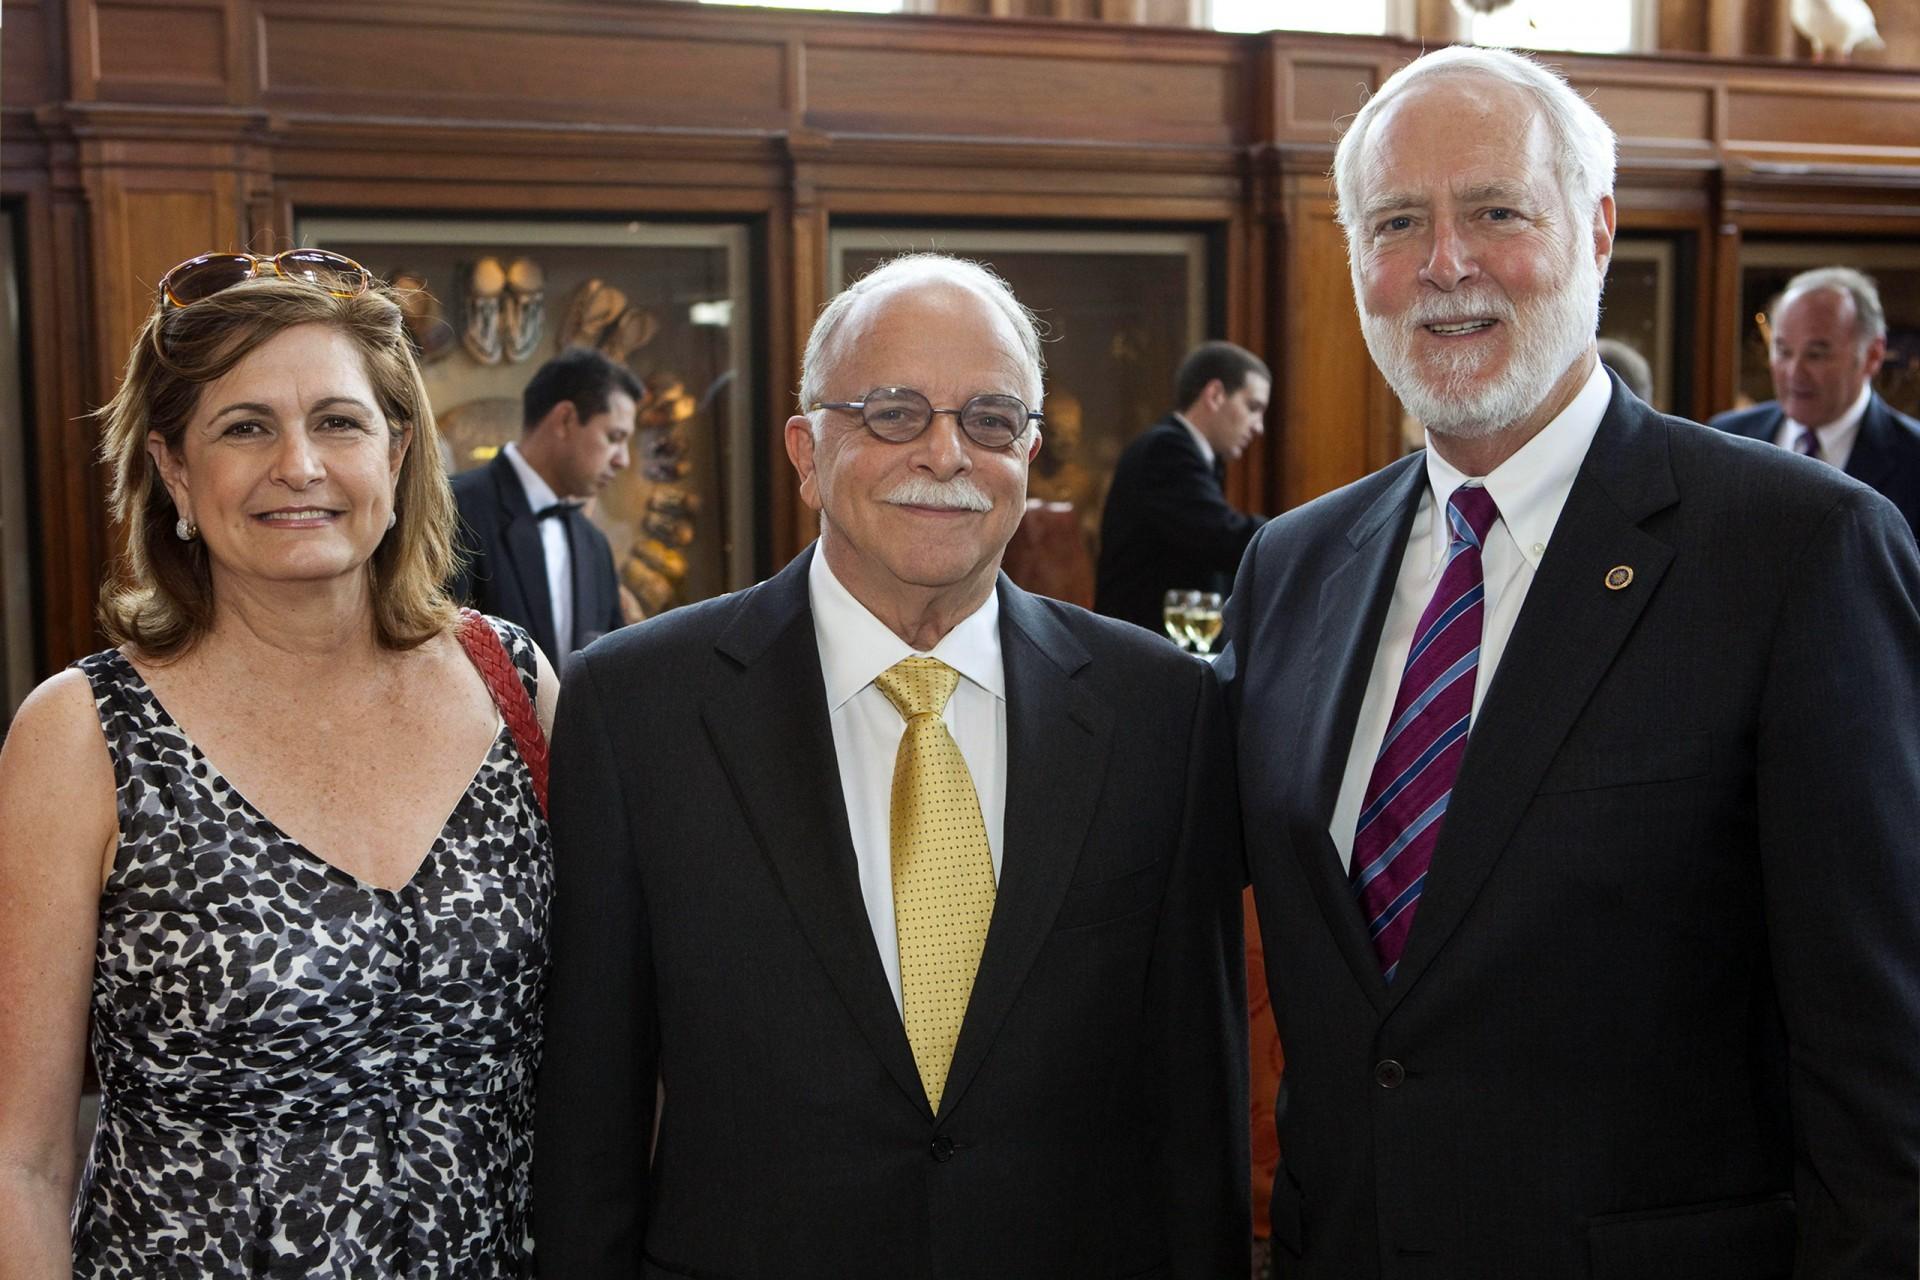 Ira Rubinoff, center, with his wife Anabella and Smithsonian Secretary Wayne Clough